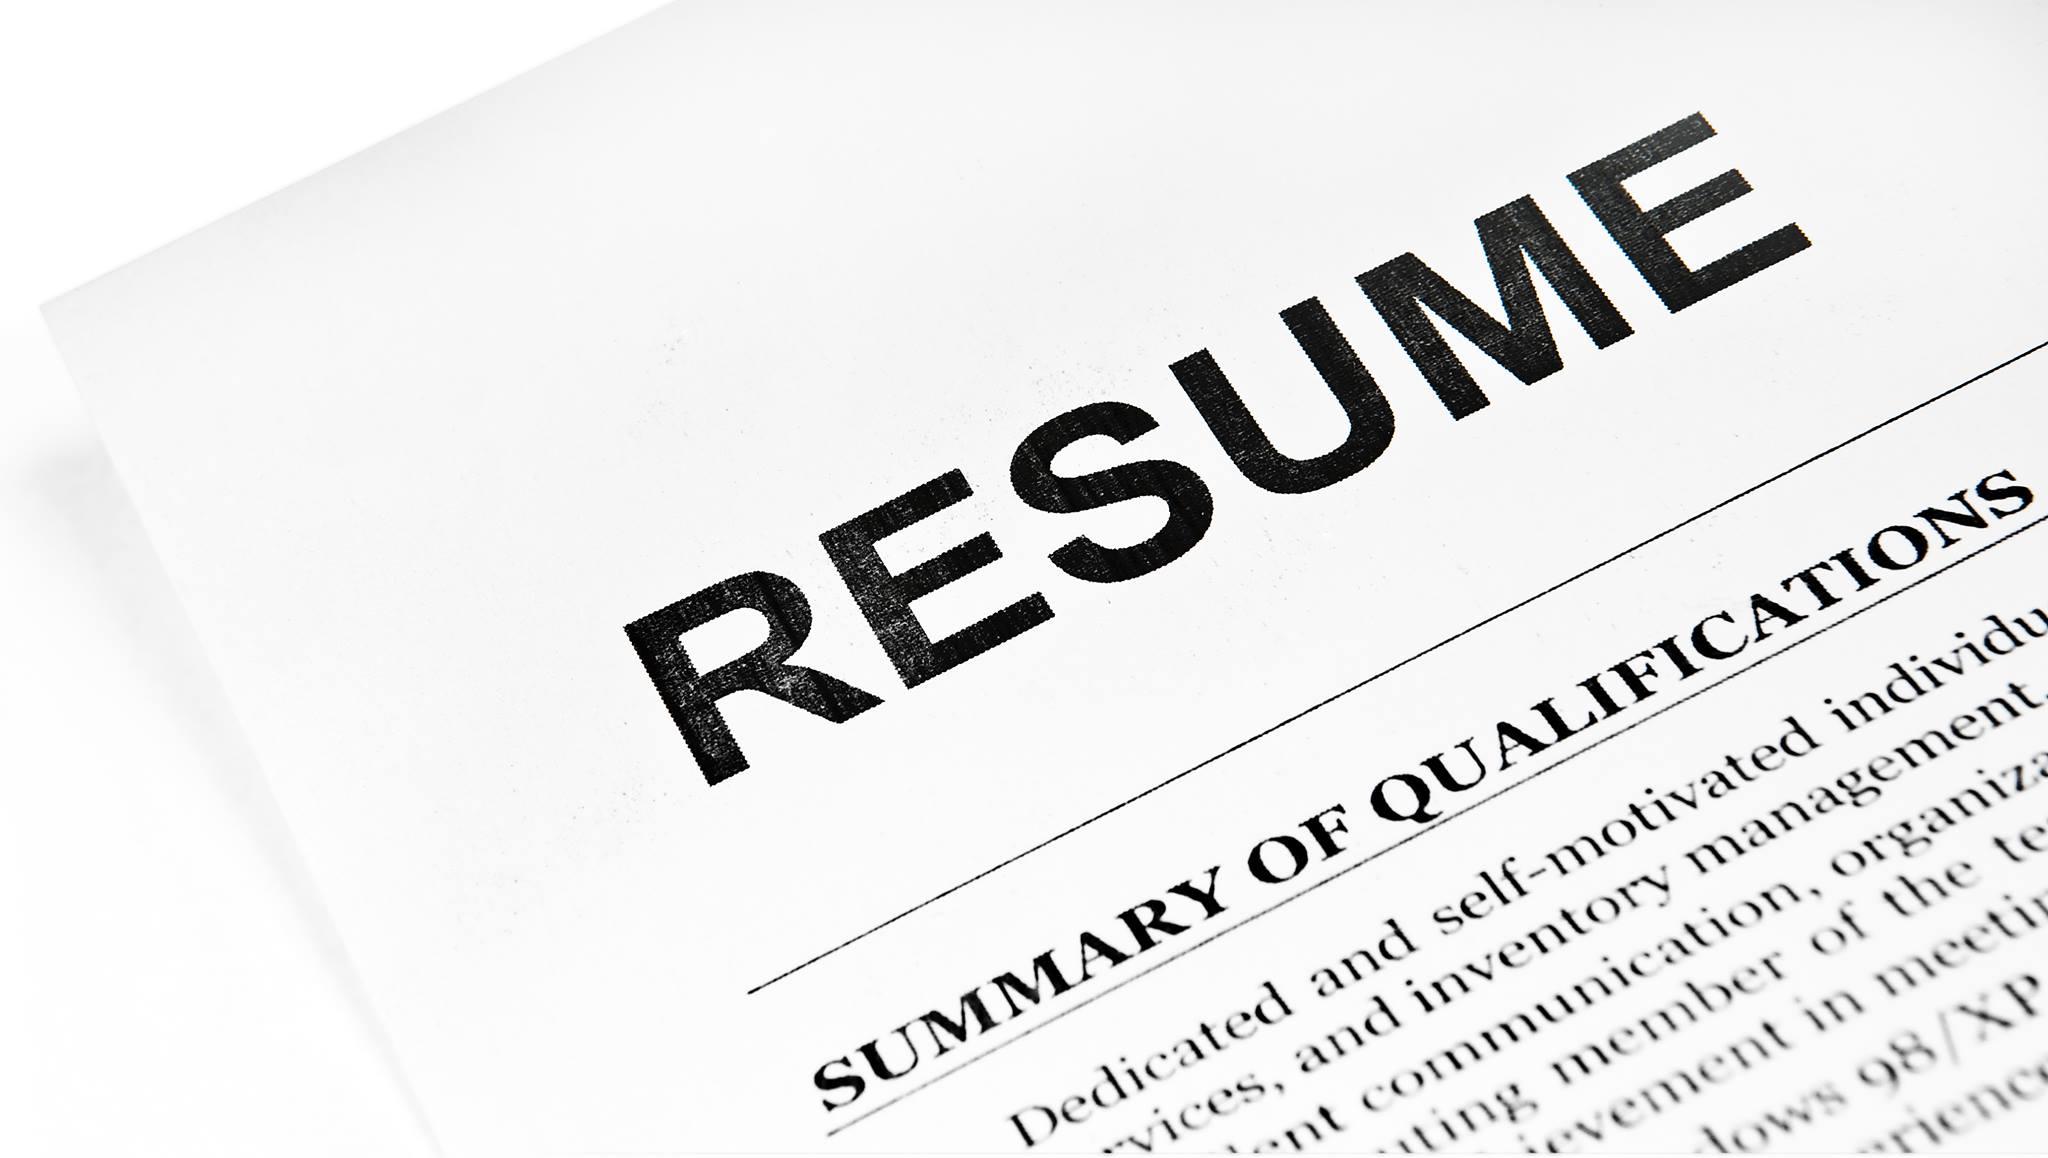 Resume Preparation and Job hunting